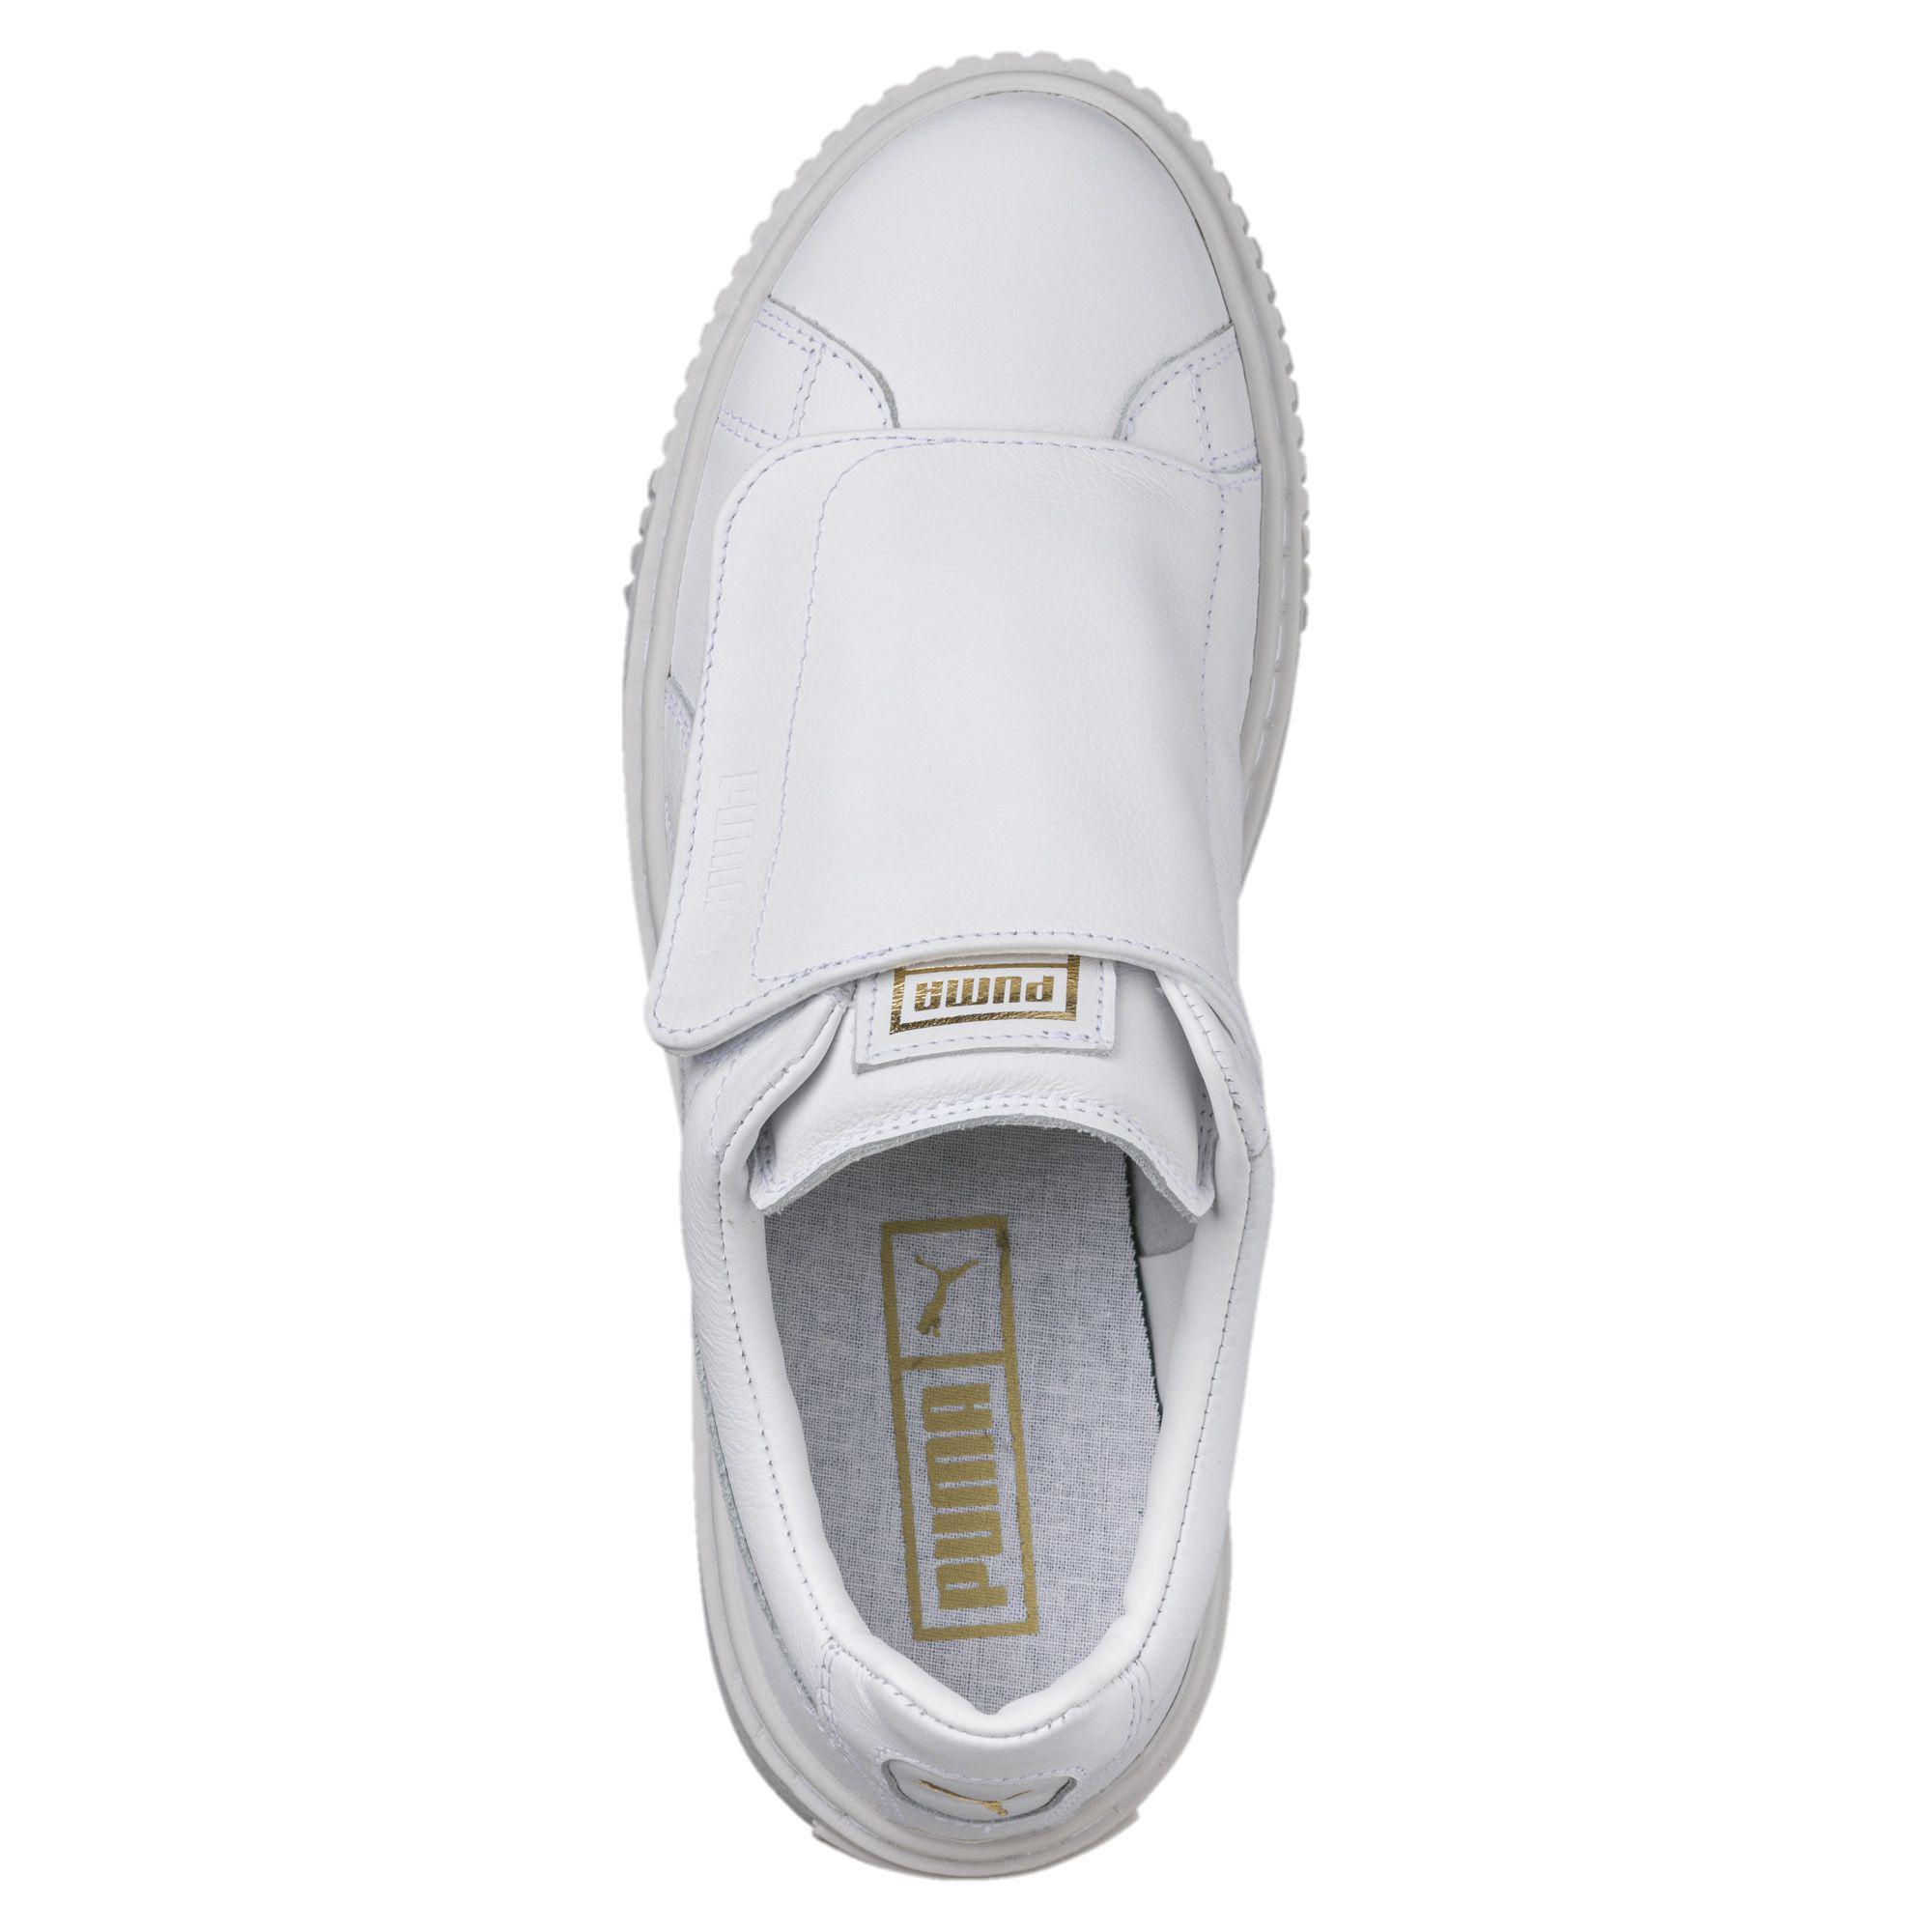 e37547d58f756e Lyst - PUMA Basket Platform Big Strap Women s Sneakers in White